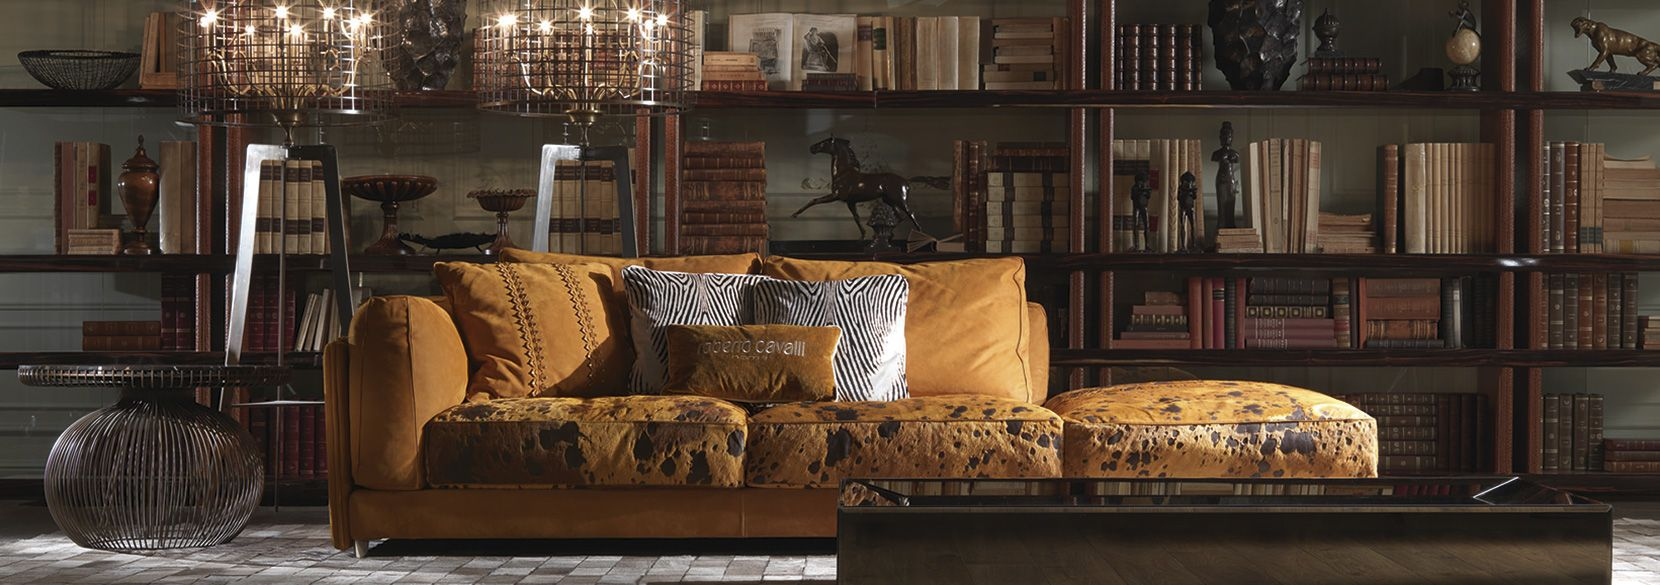 Roberto Cavalli Home Interior Home Interior Inspiration